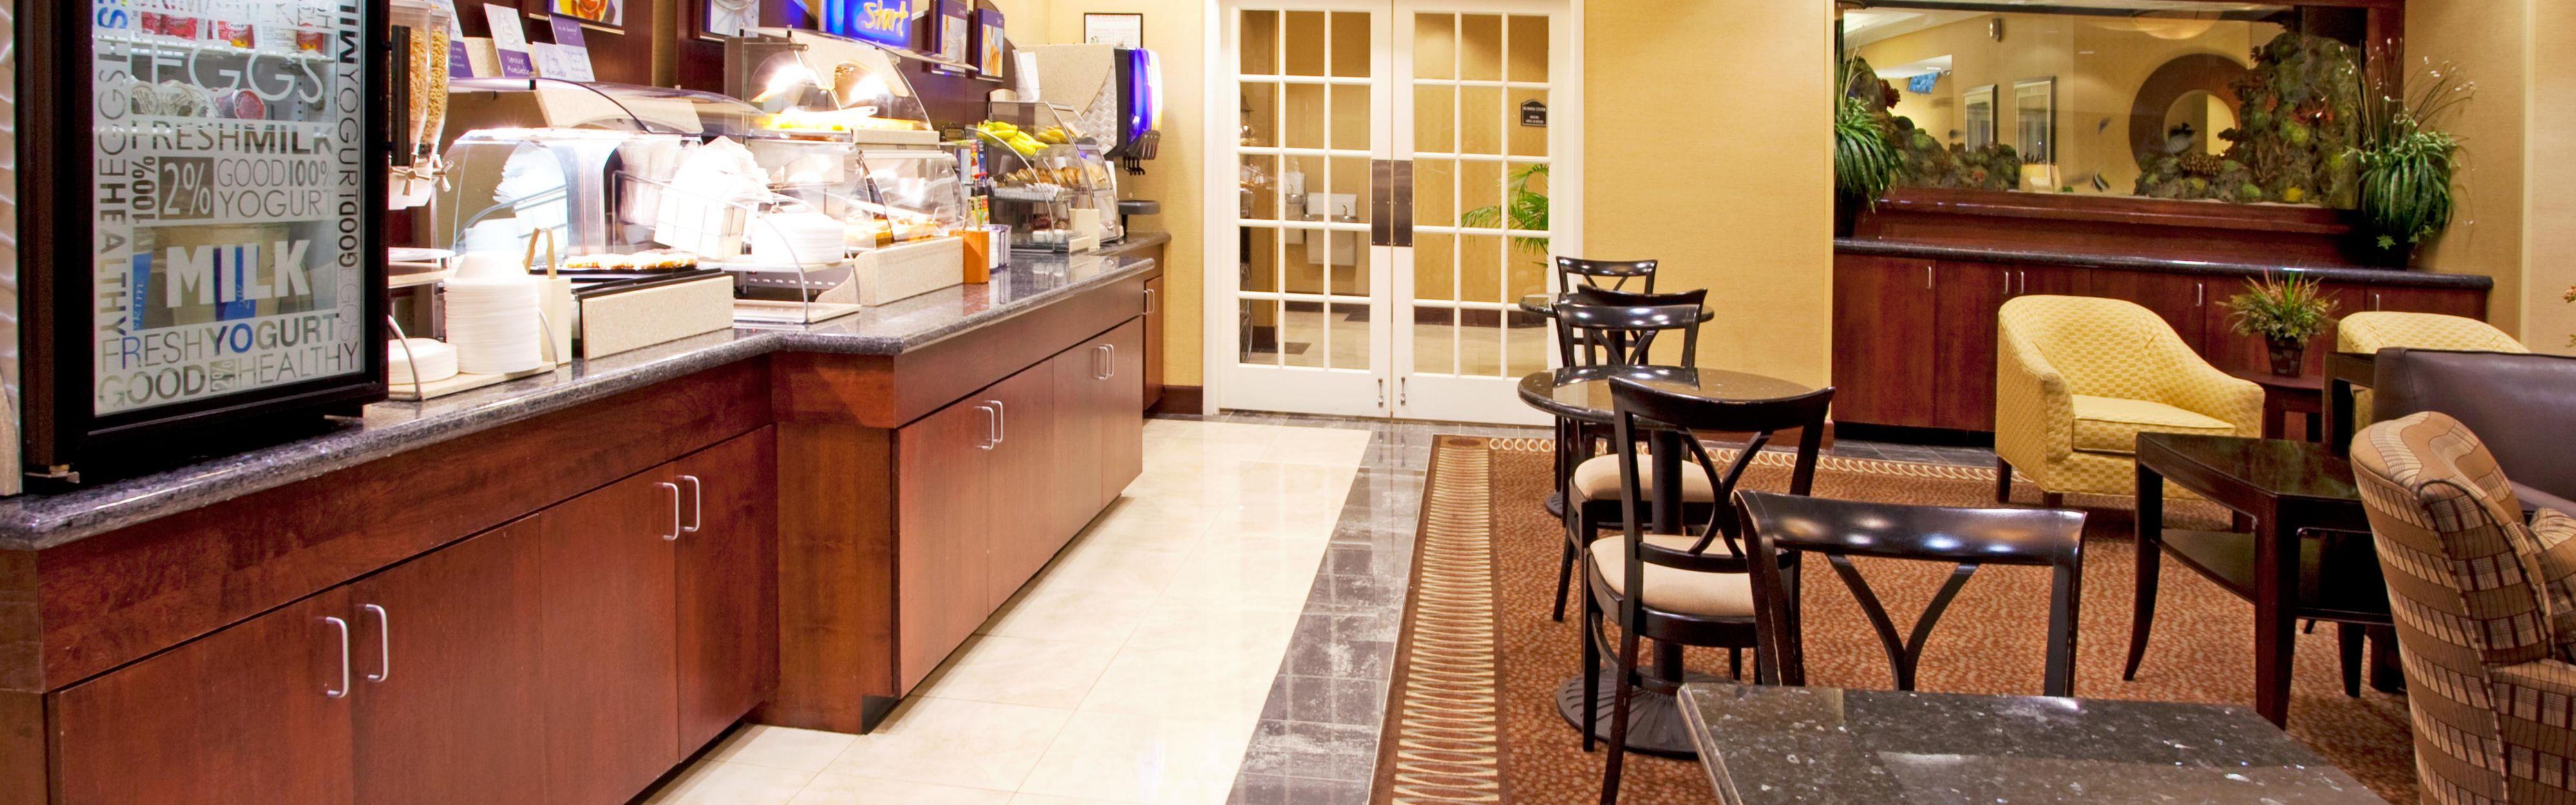 Holiday Inn Express & Suites Columbus At Northlake image 3